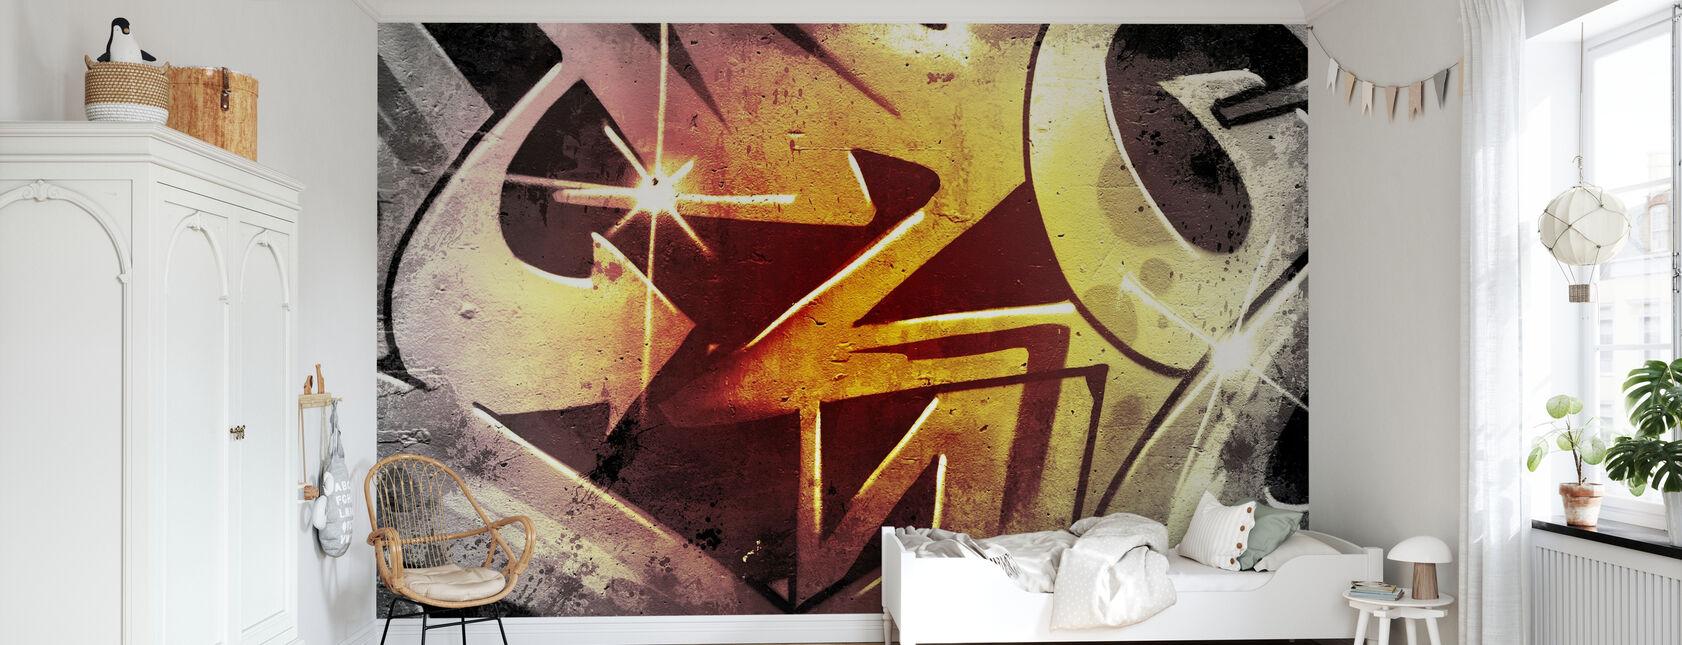 Graffiti vanhan likaisen muurin yli - Tapetti - Lastenhuone